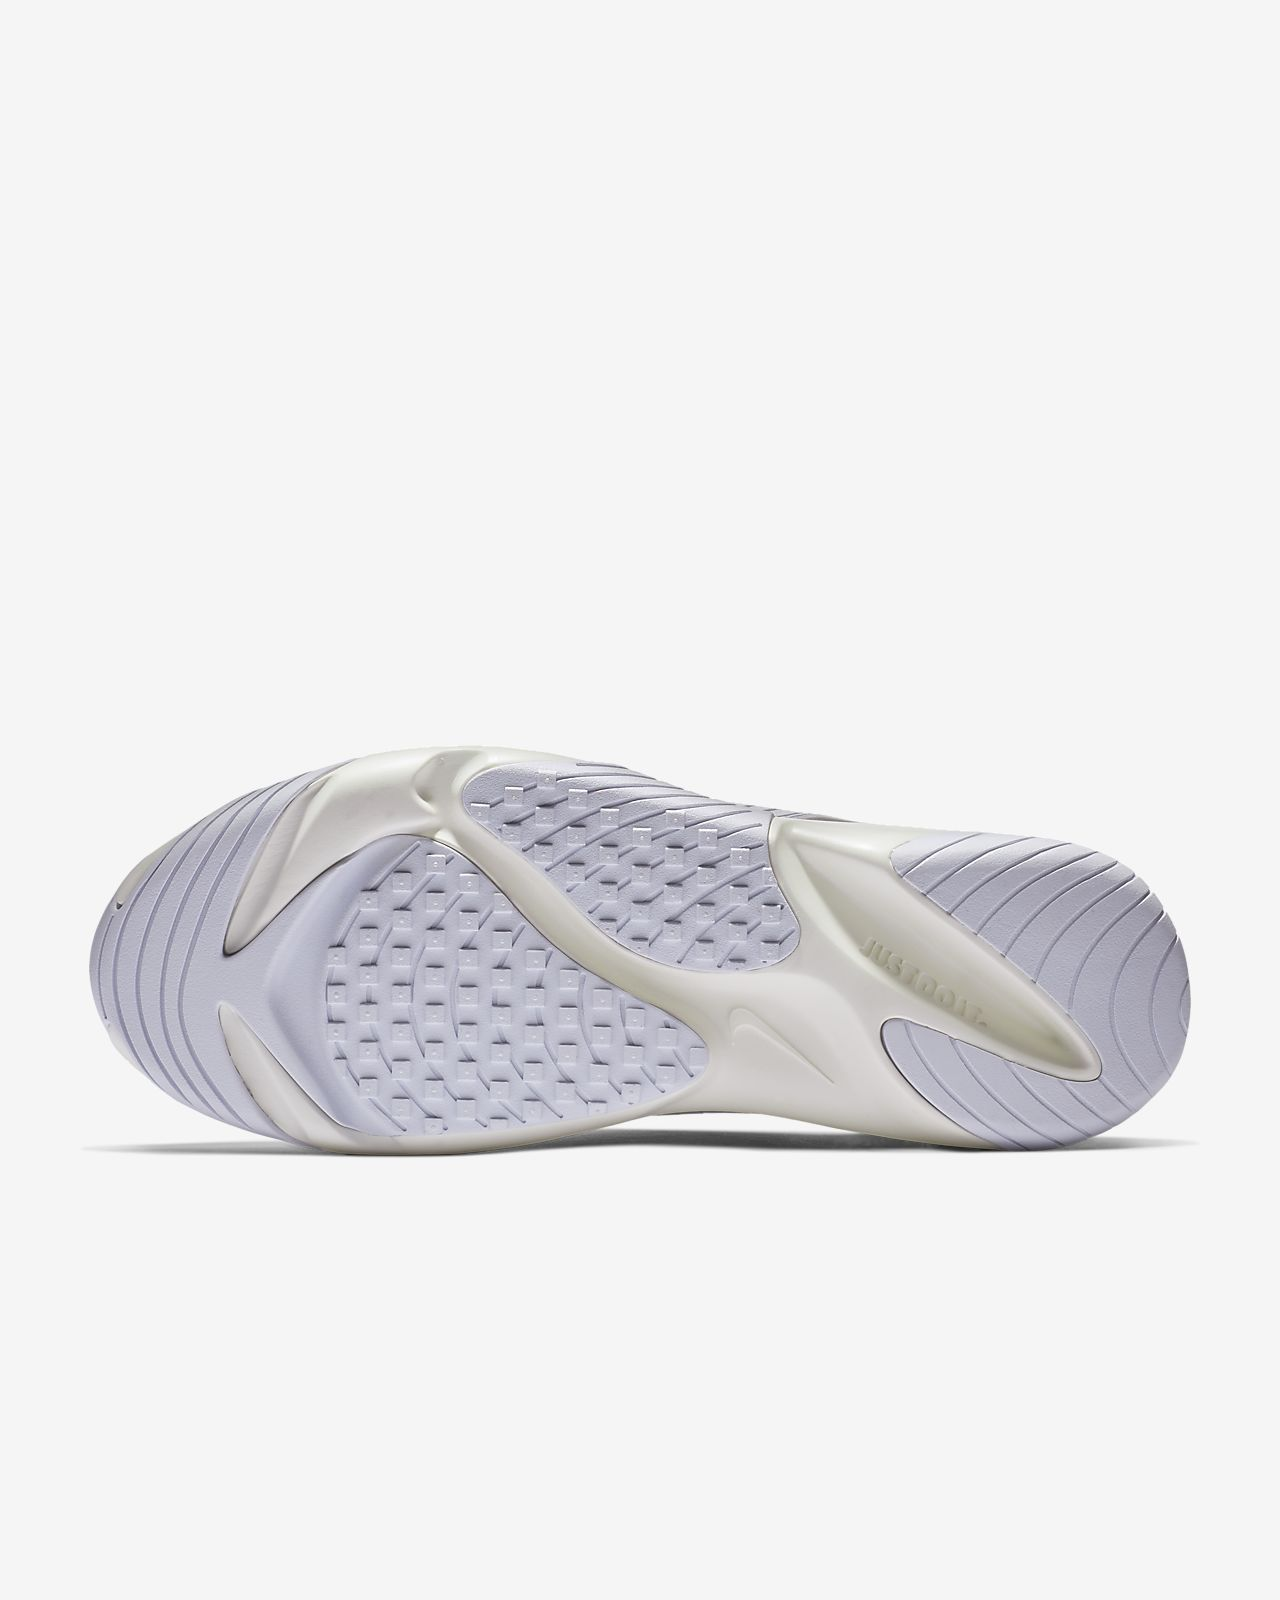 1aba5884435d Мужские кроссовки Nike Zoom 2K